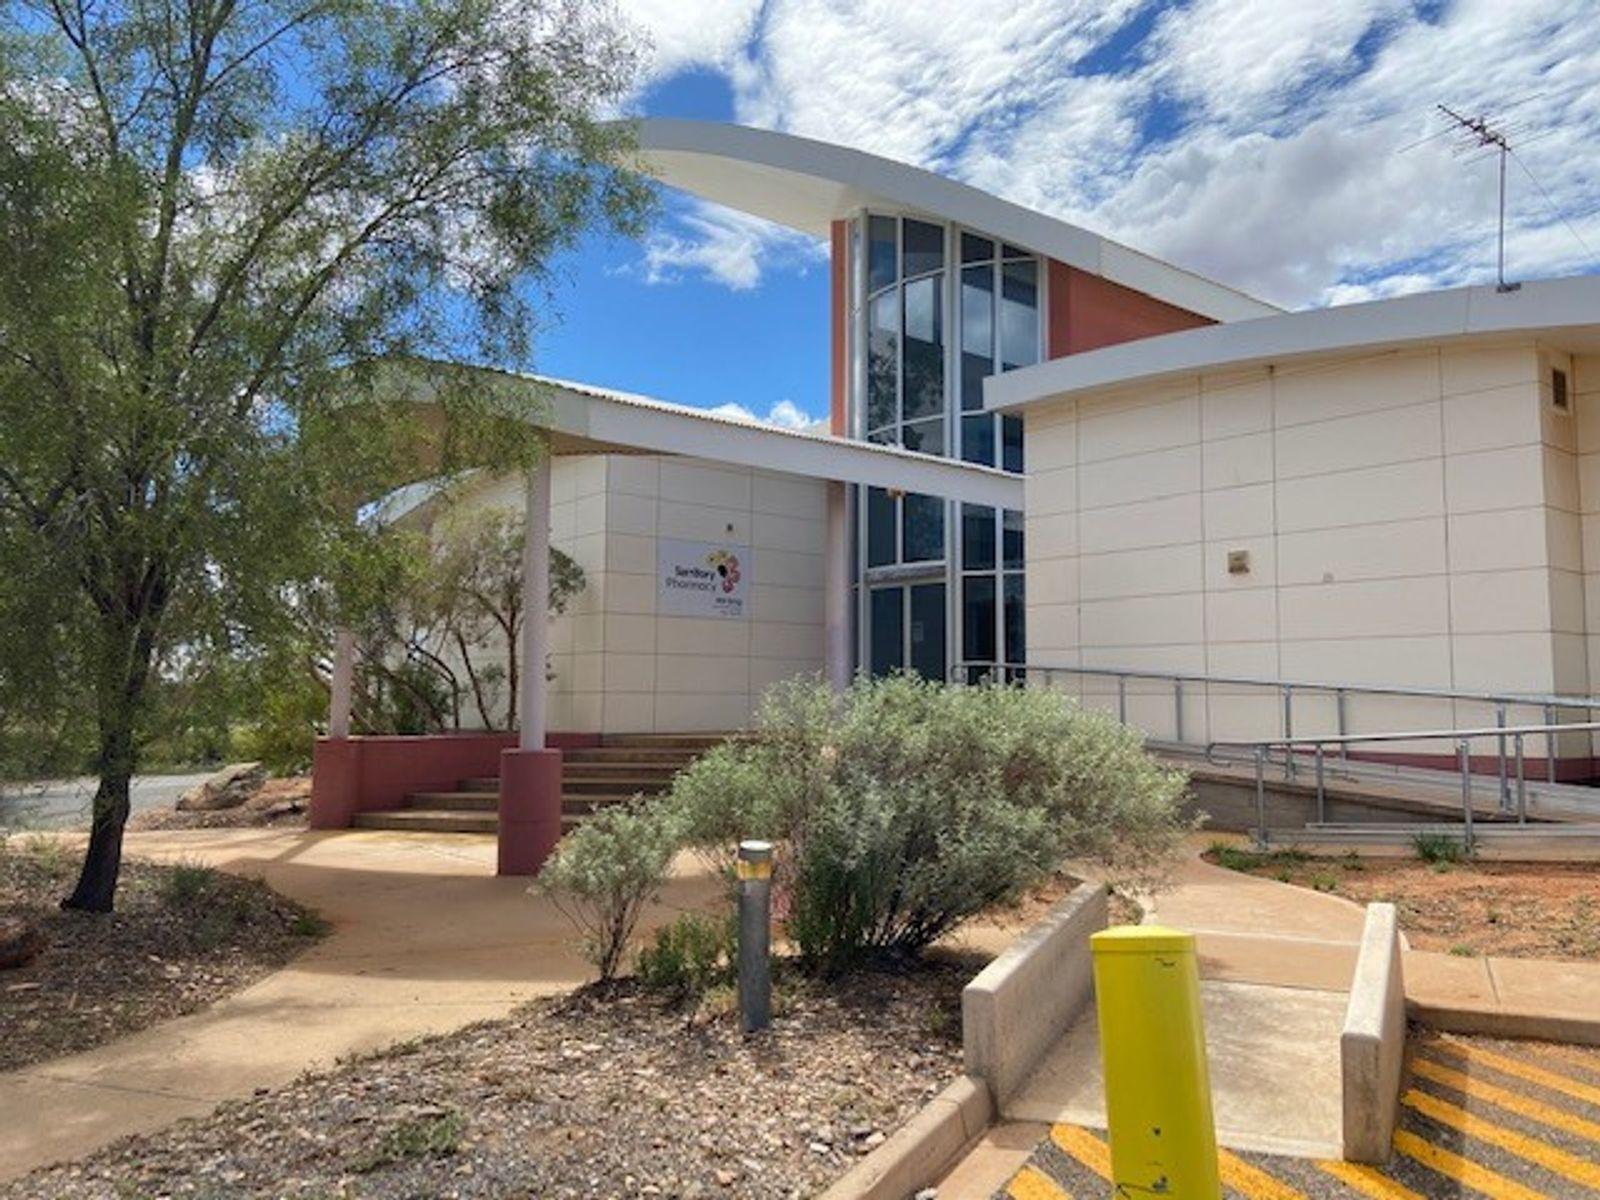 201C/2 Brigg Street, Alice Springs, NT 0870